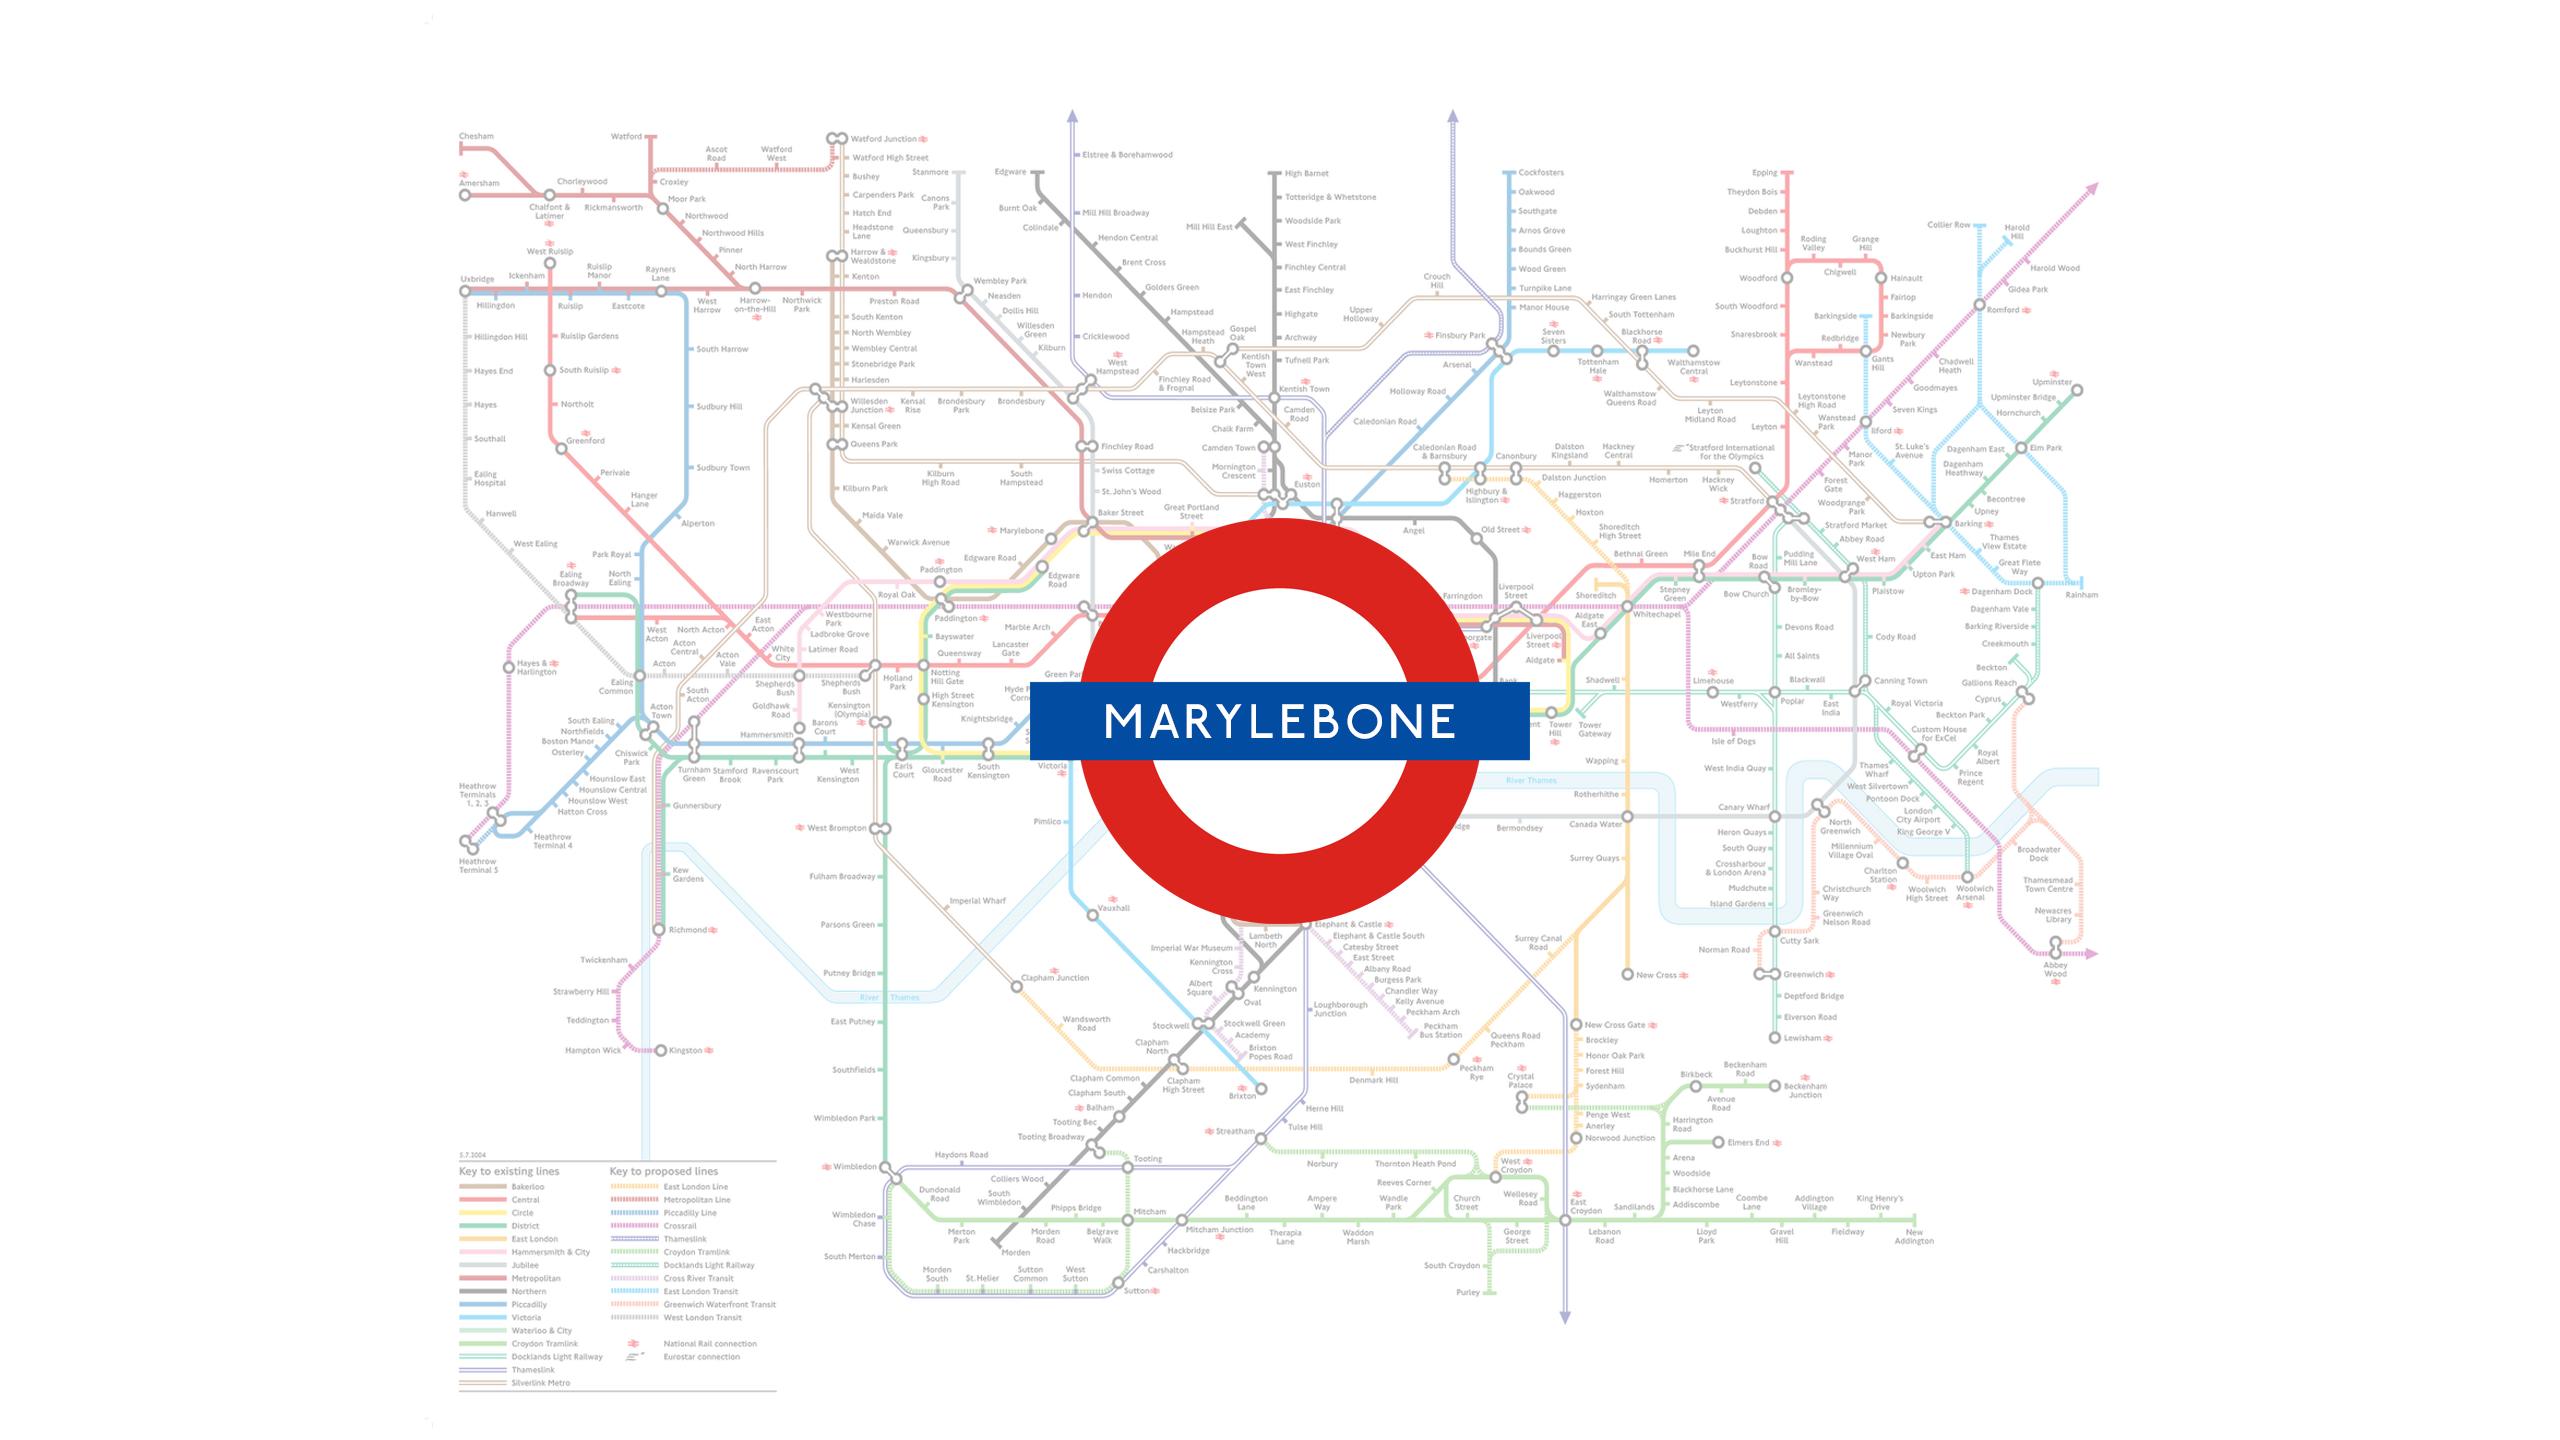 Marylebone (Map)